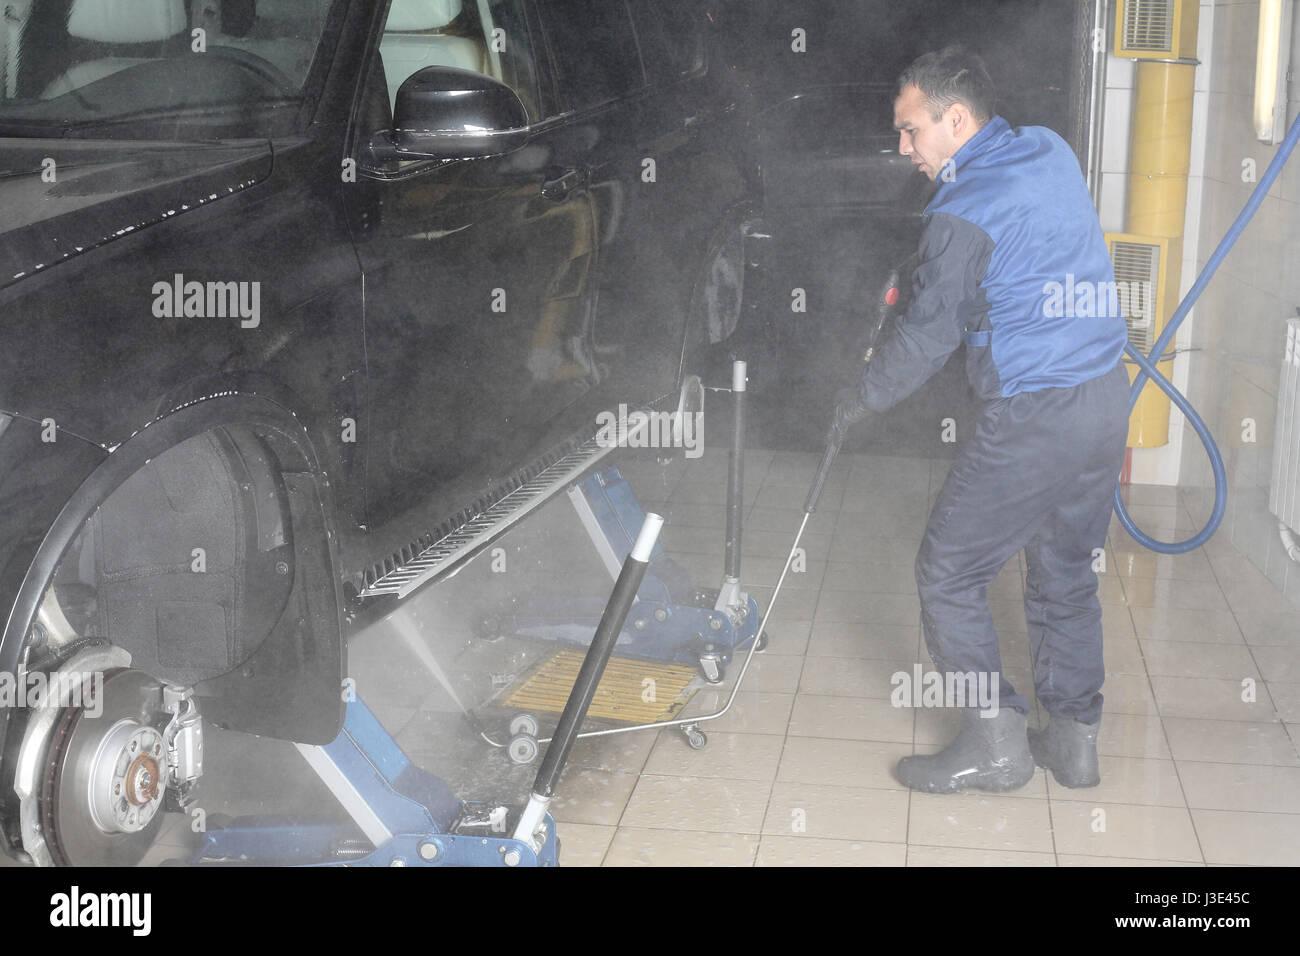 Car Wash Business Spray Stockfotos & Car Wash Business Spray Bilder ...